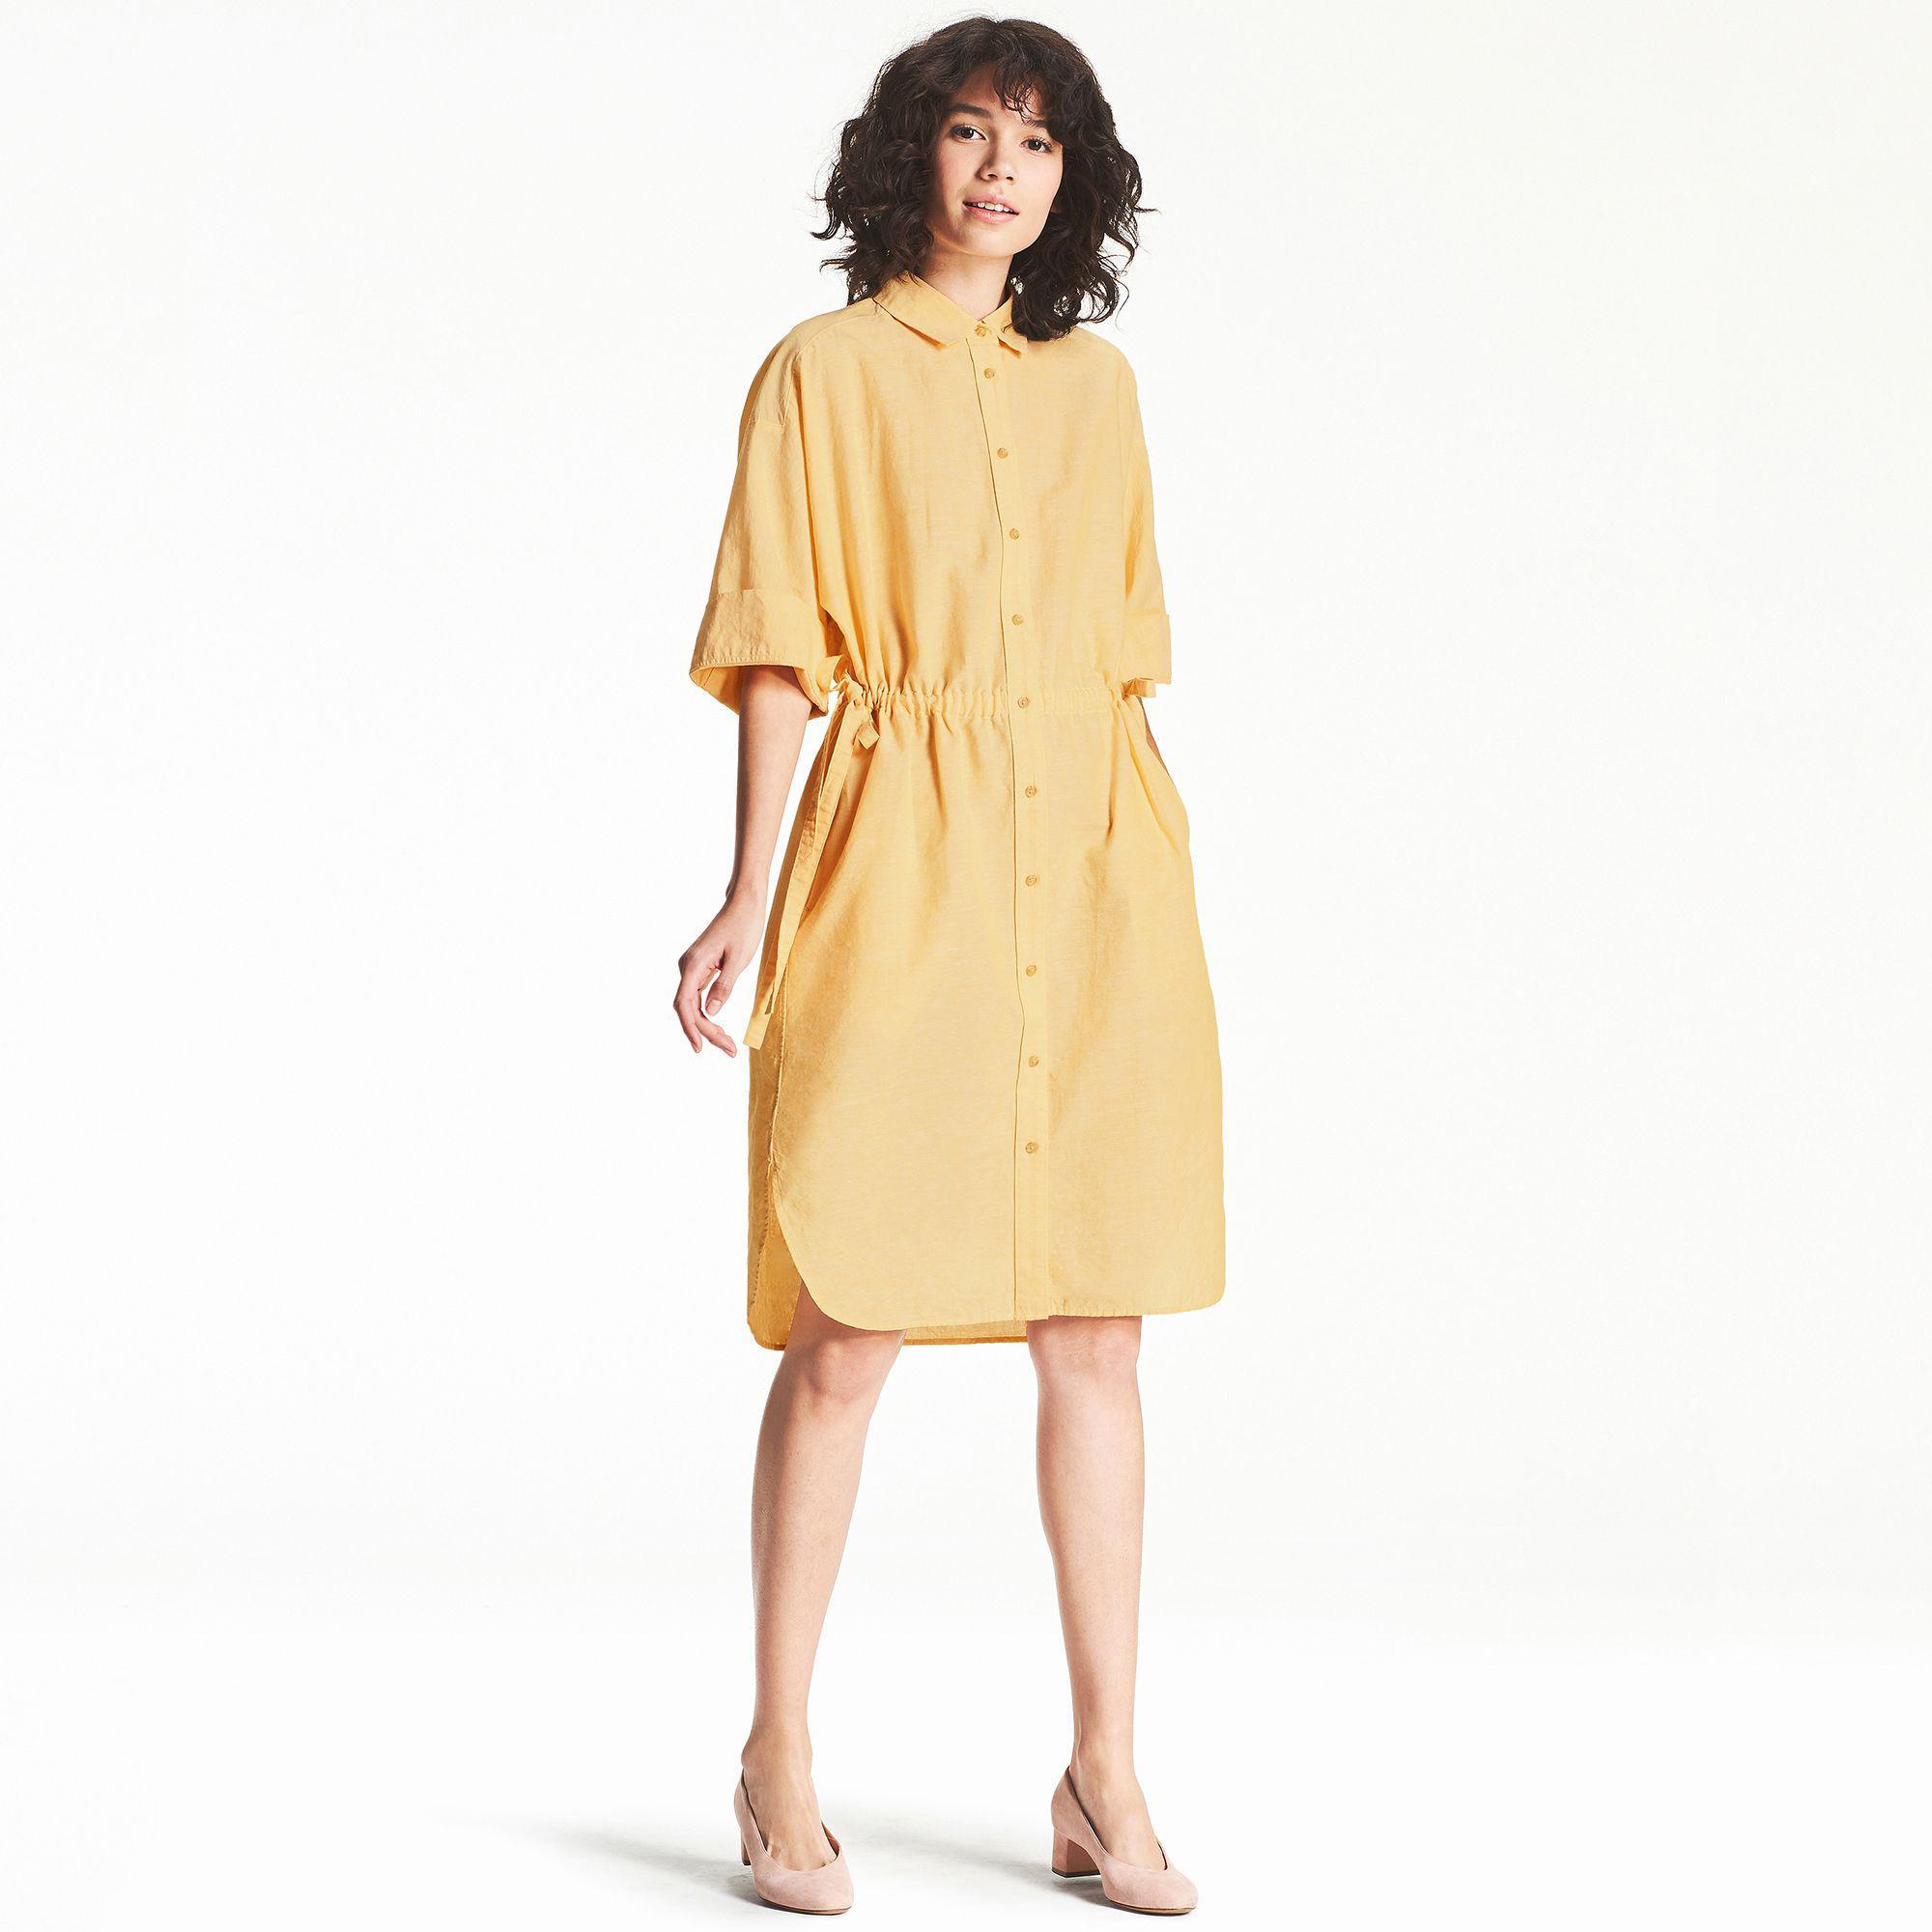 68f40cb8da9 Uniqlo Linen Cotton Shirt Dress